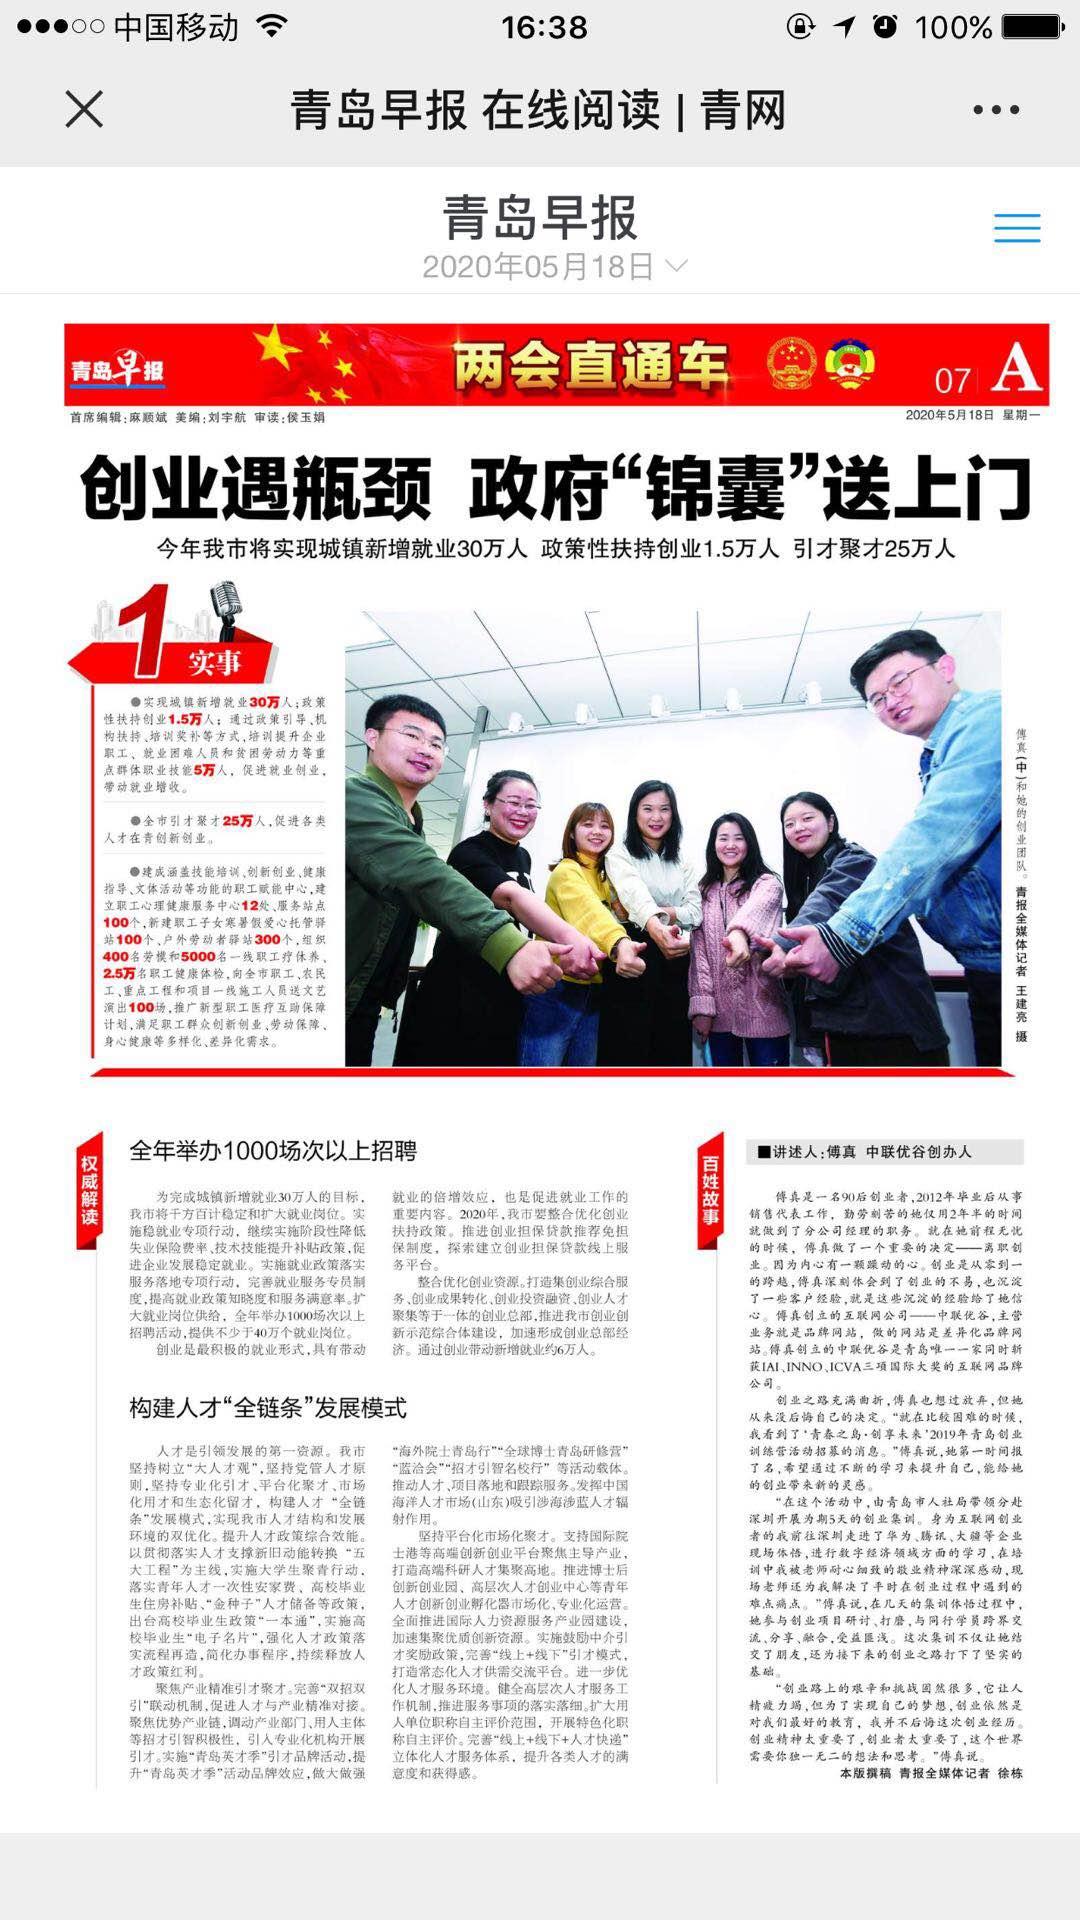 https://ossimagewebhm.oss-cn-qingdao.aliyuncs.com/zlygu/images/报纸清晰.jpg